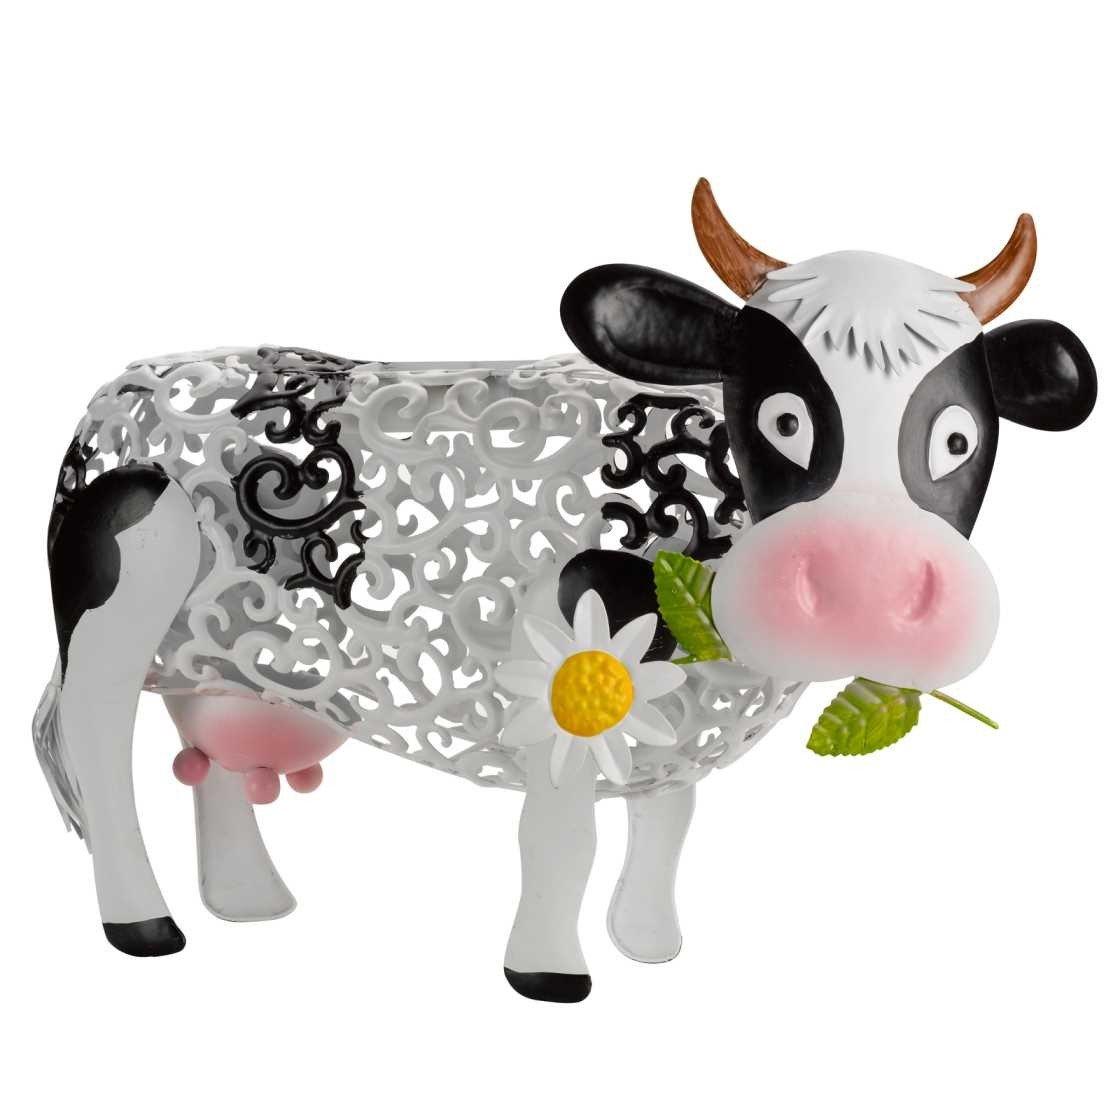 Smart Garden Metal Silhouette Solar Light - Daisy Cow